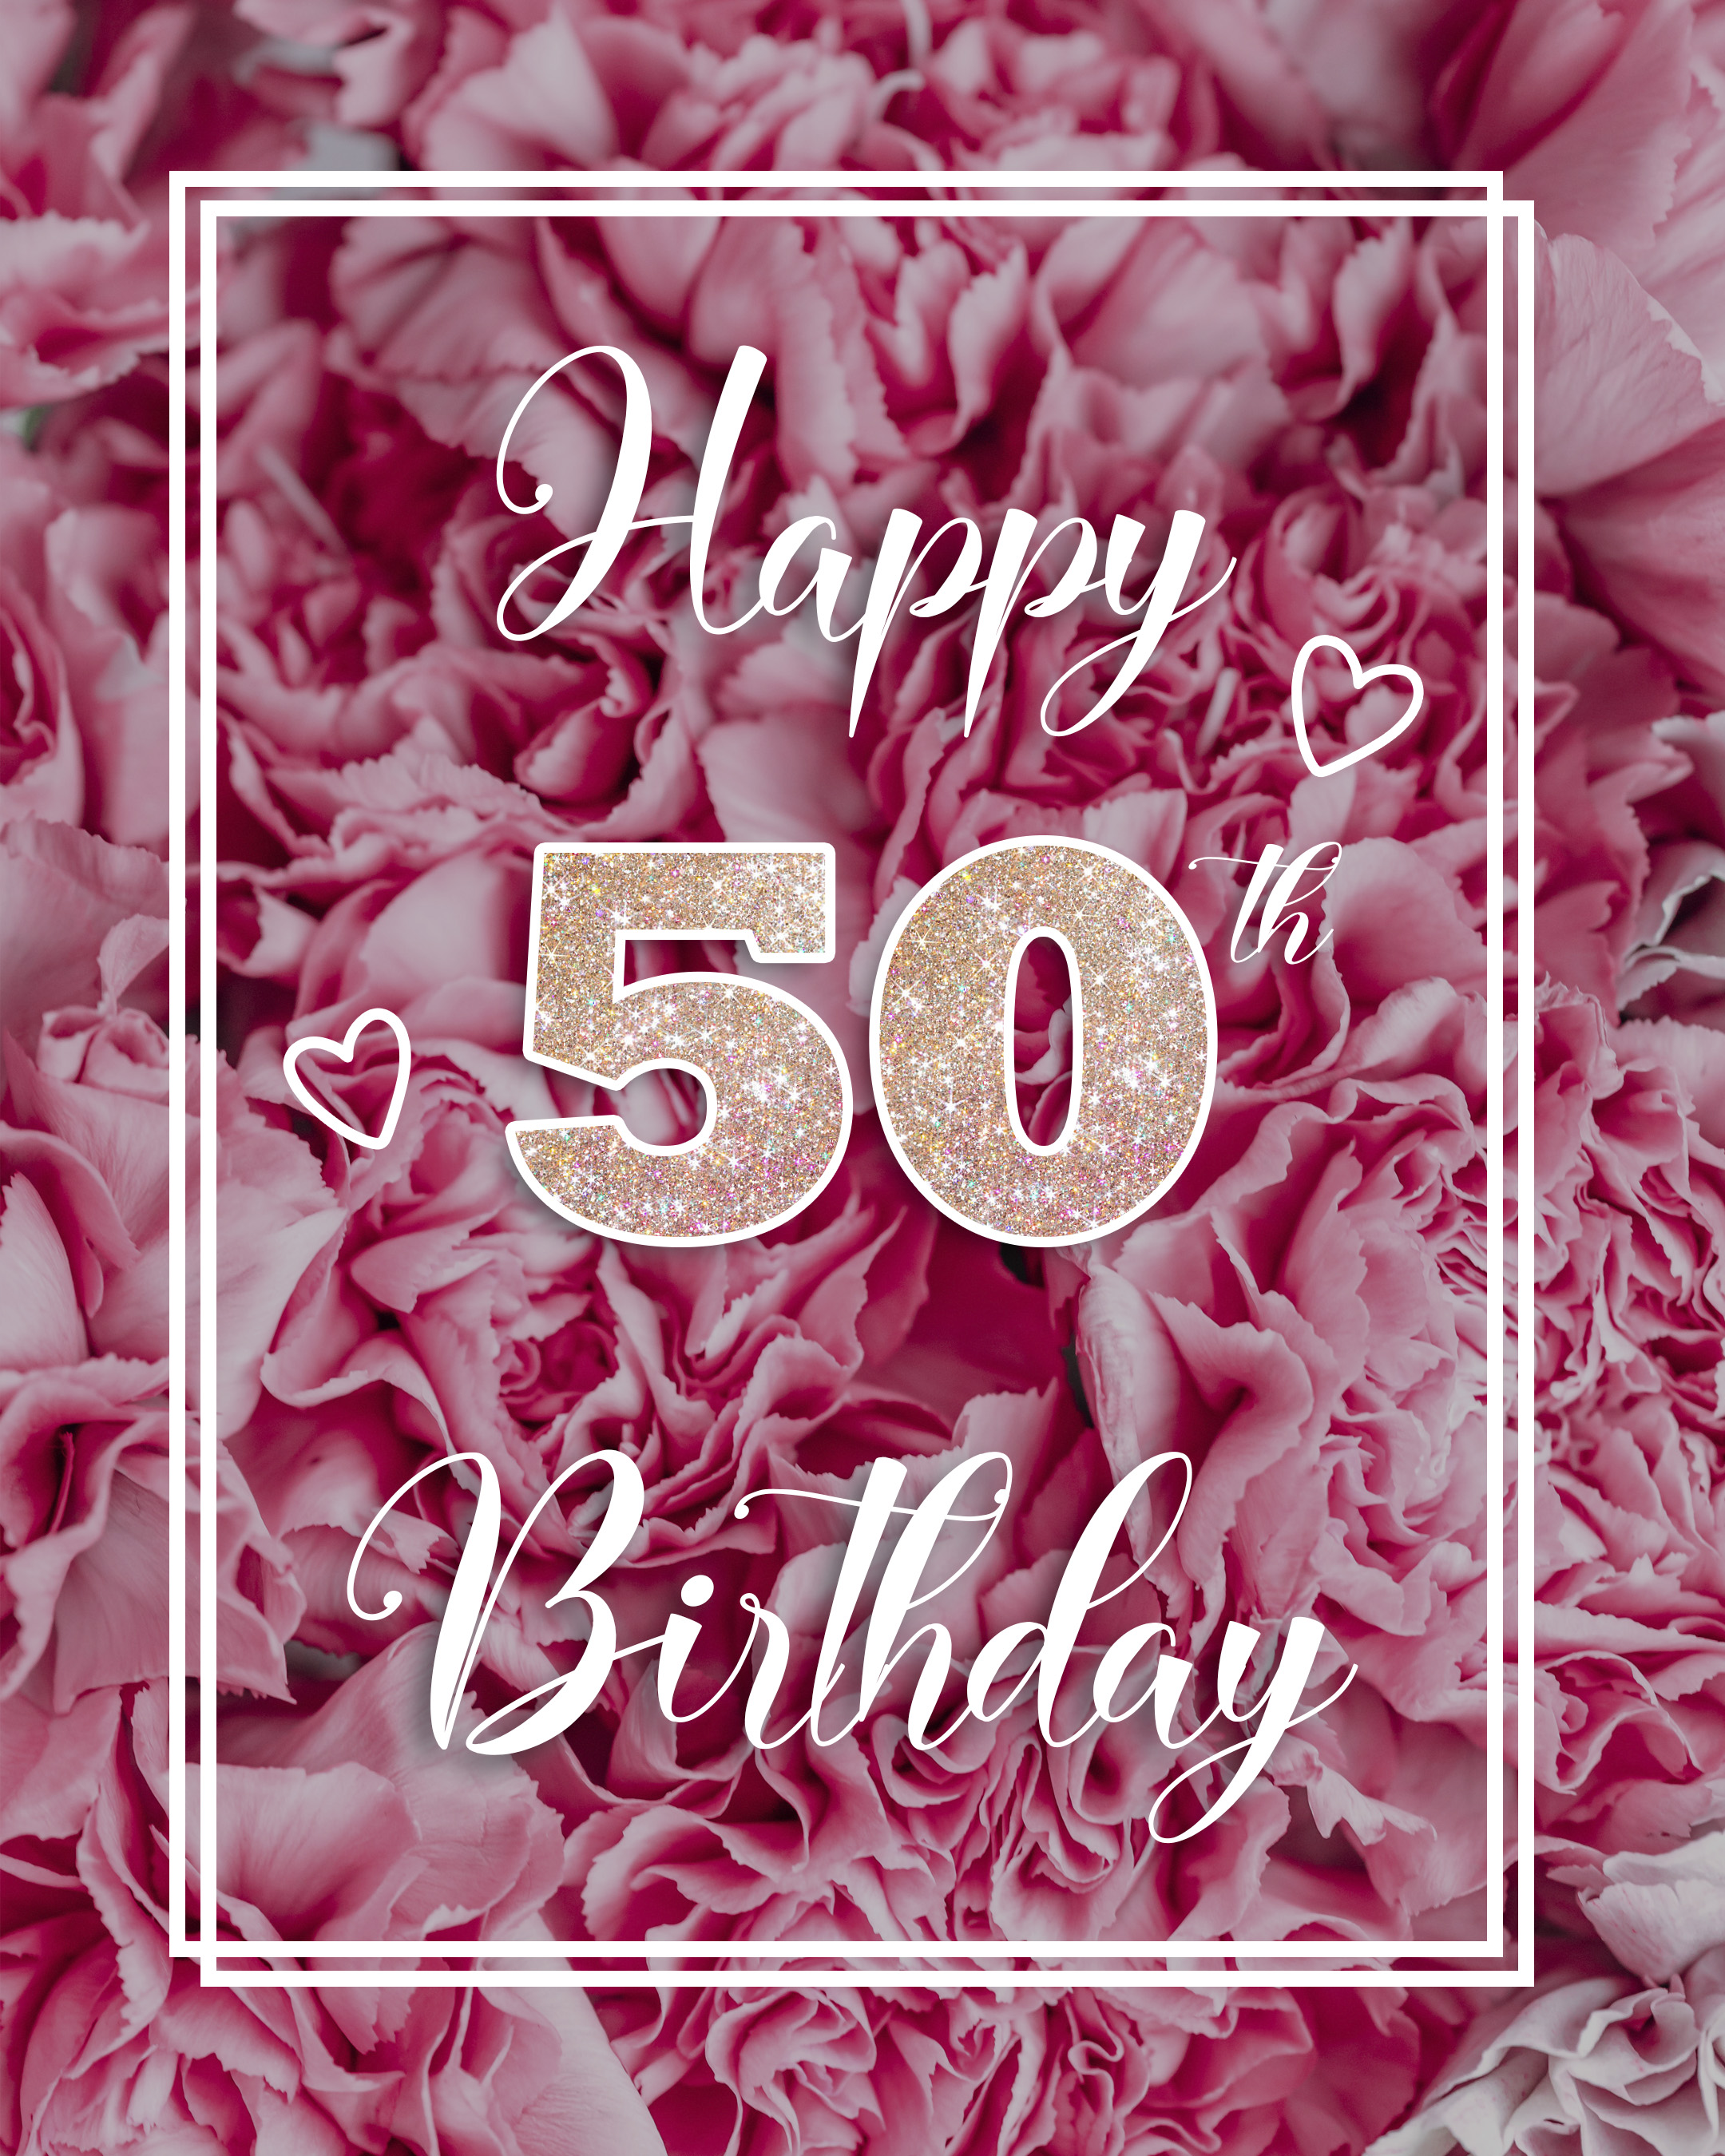 Free 50th Years Happy Birthday Image With Pink Flowers - birthdayimg.com